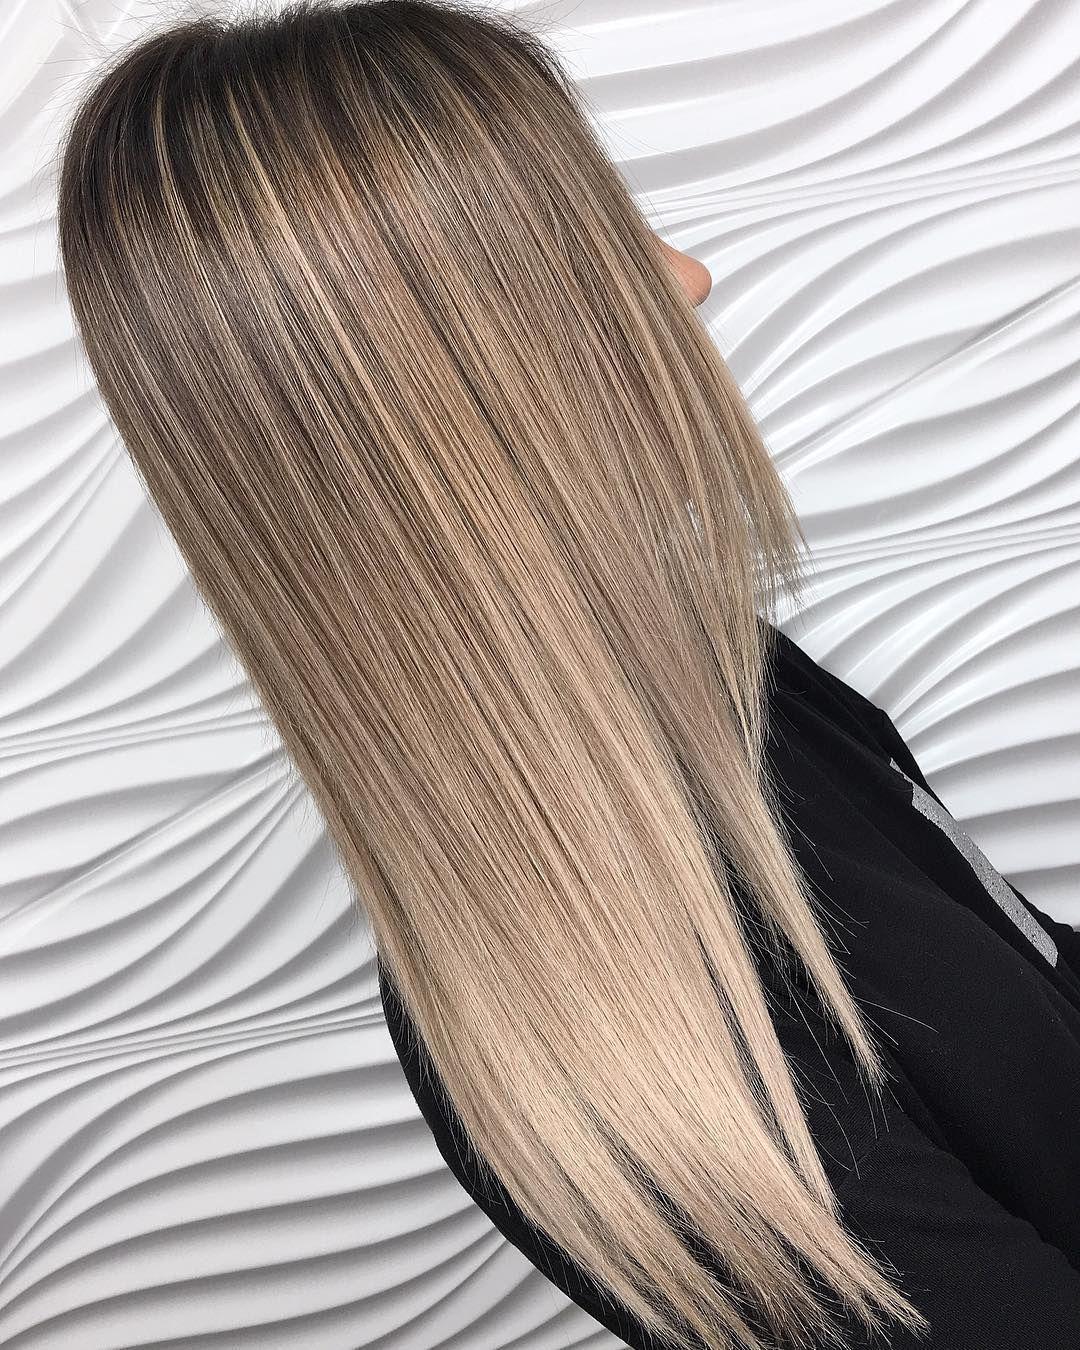 Вечерние прически на короткие волосы фото женские последняя